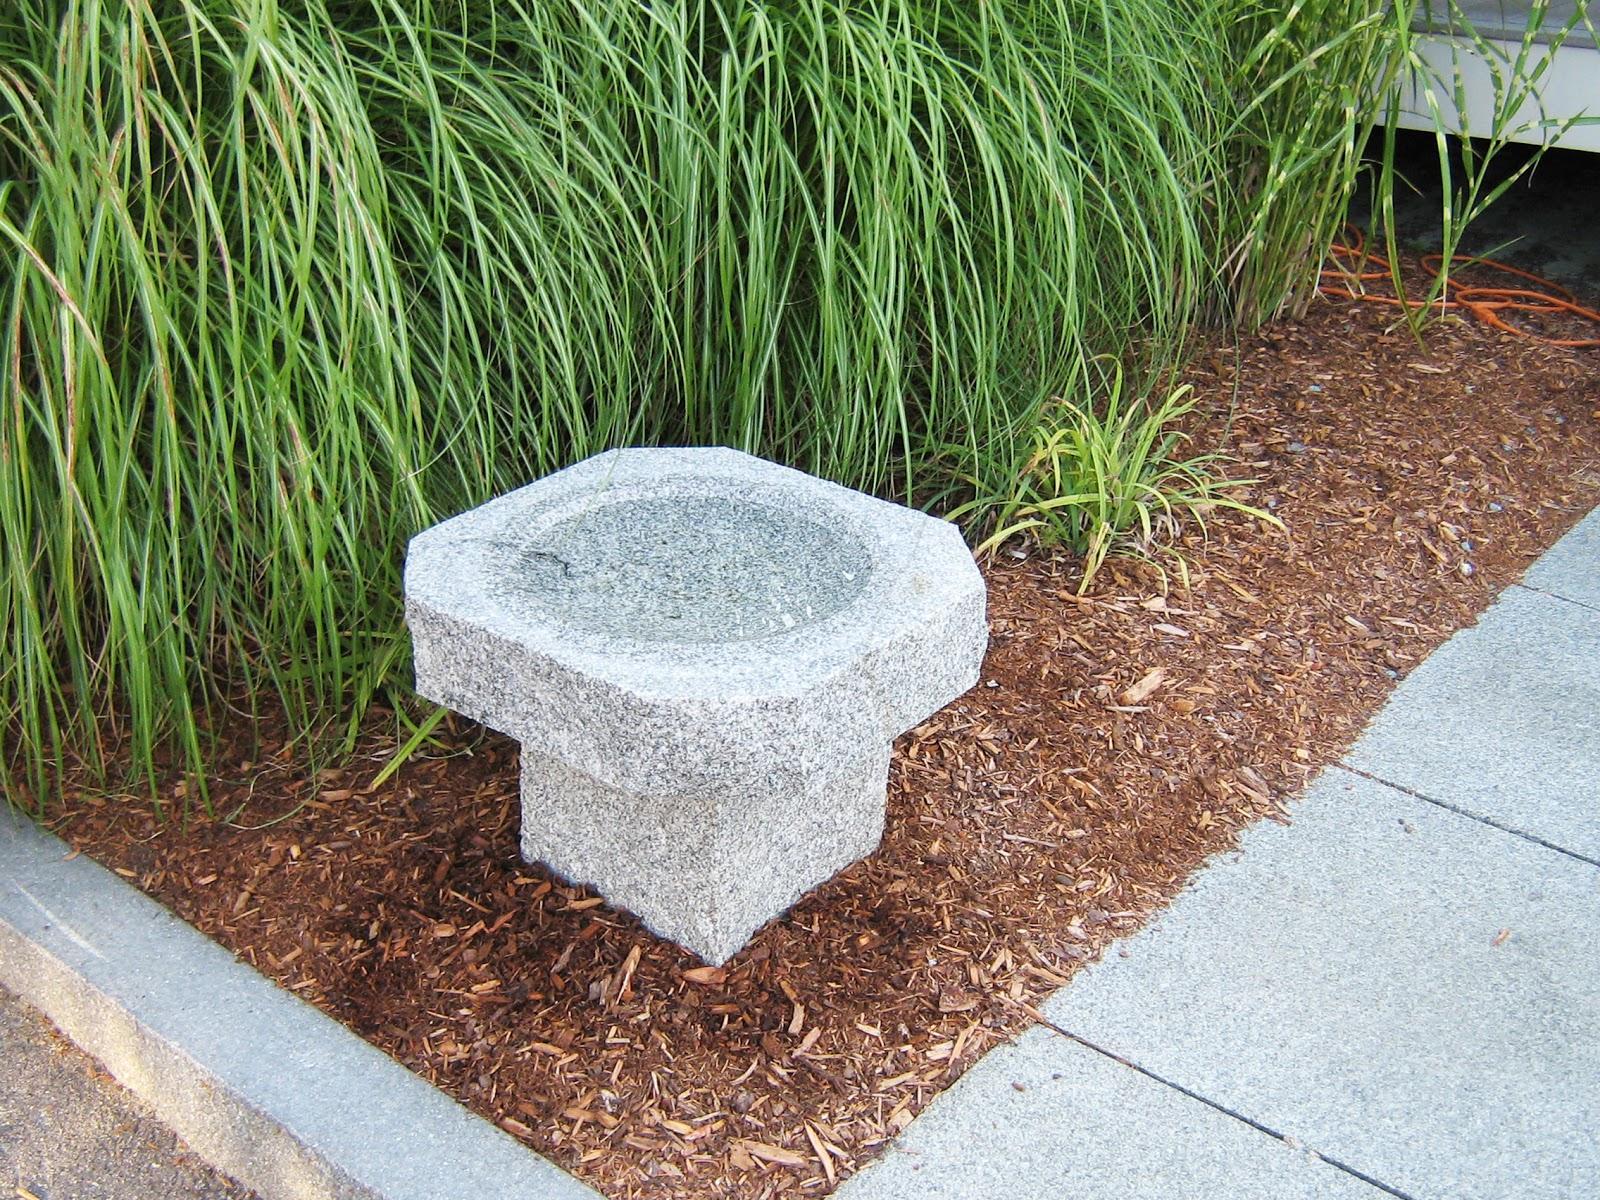 Woodbury Gray granite octagon bird bath